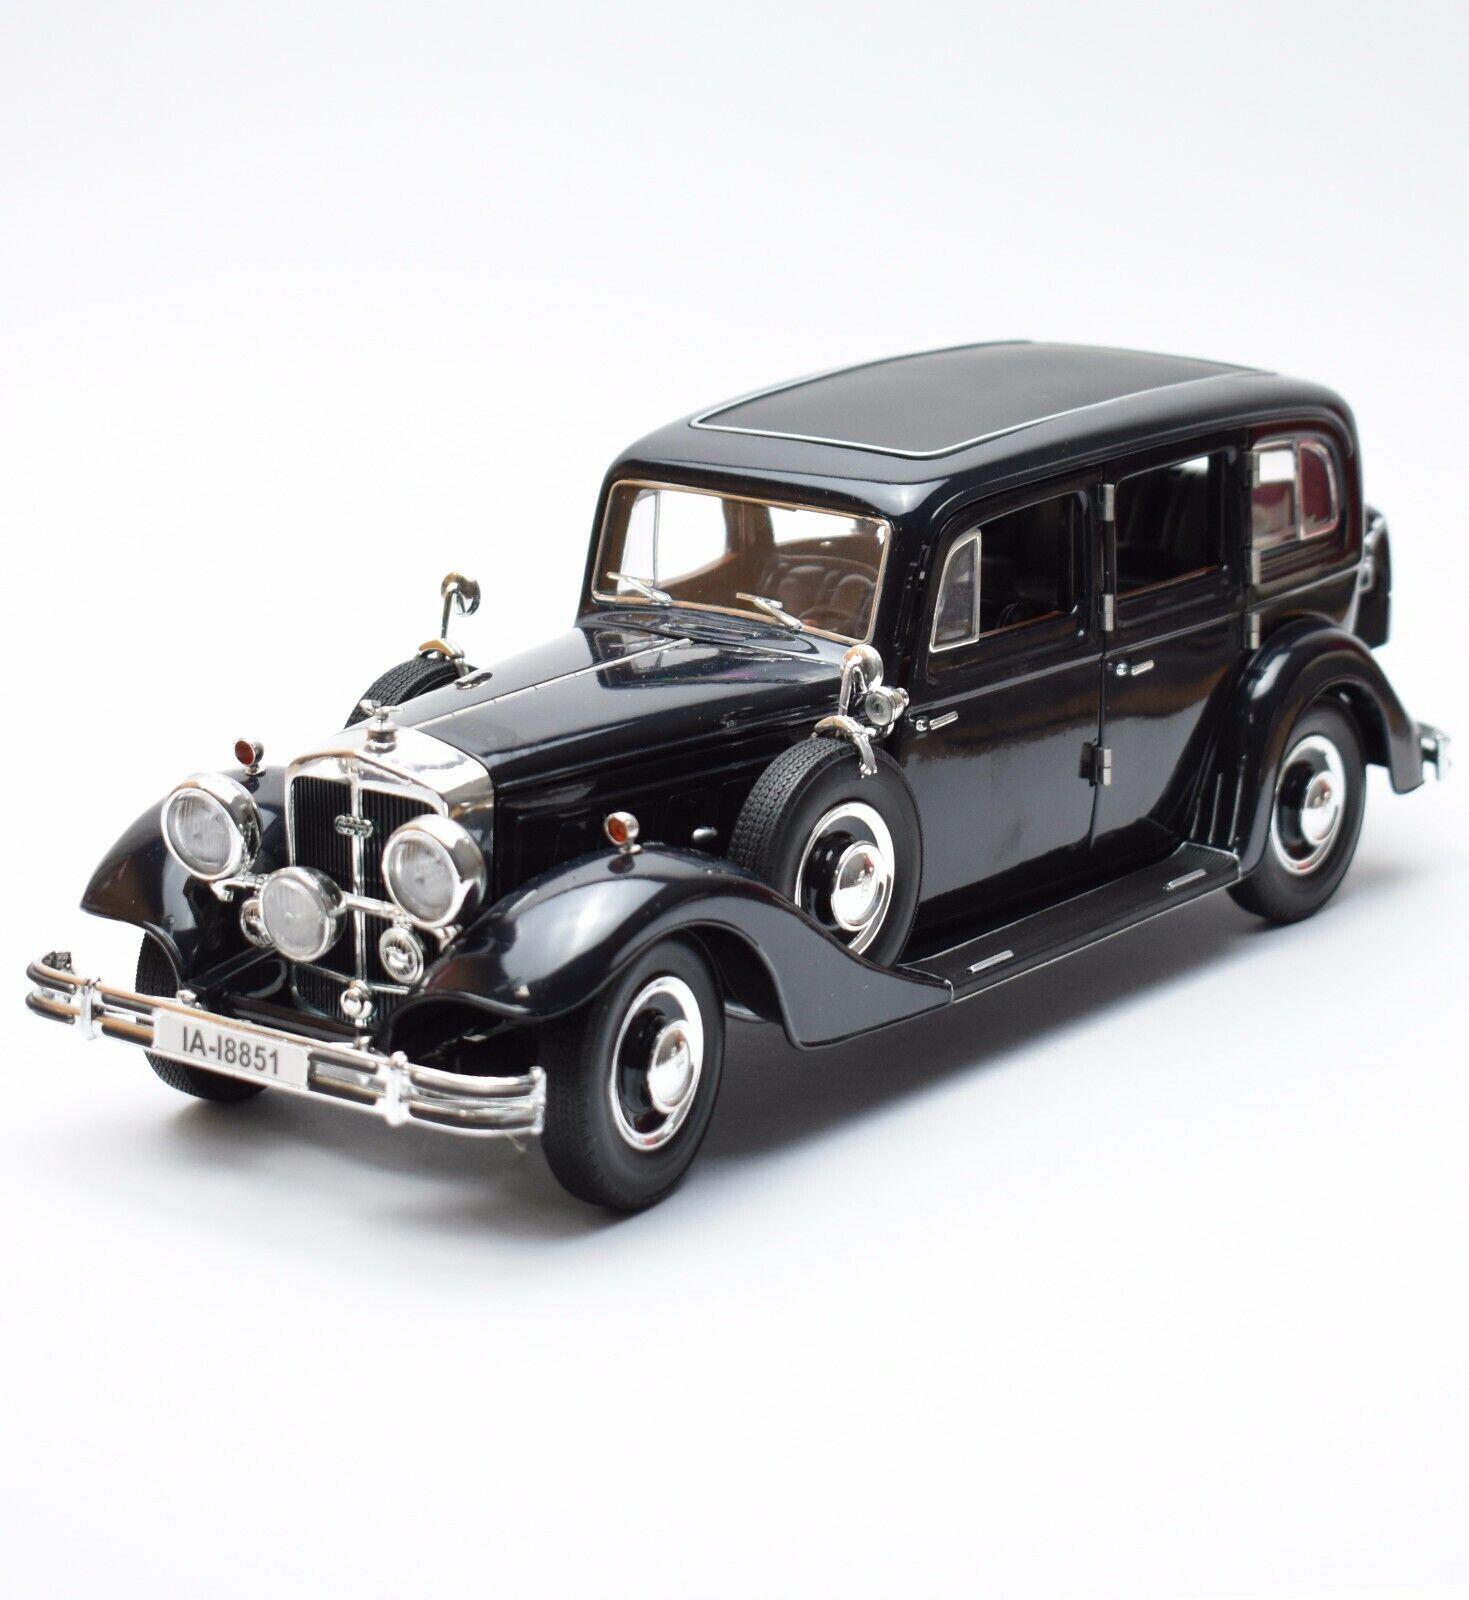 Ricko horch 851 Pullman Oldtimer año 1935 en nero pintado, OVP, 1 18, k007